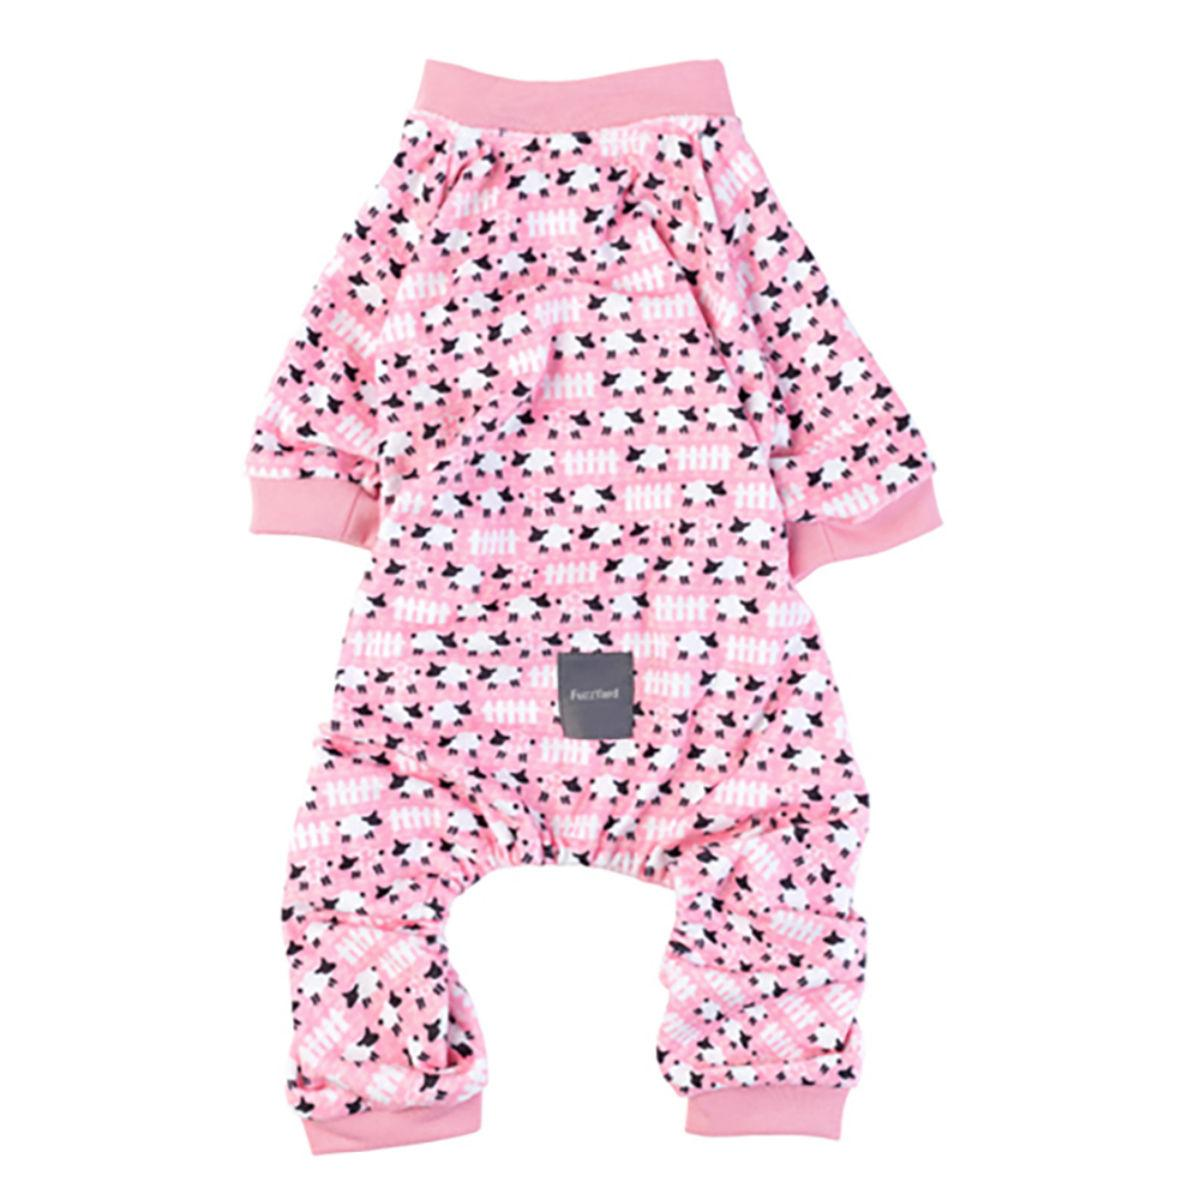 FuzzYard Counting Sheep Dog Pajamas - Pink